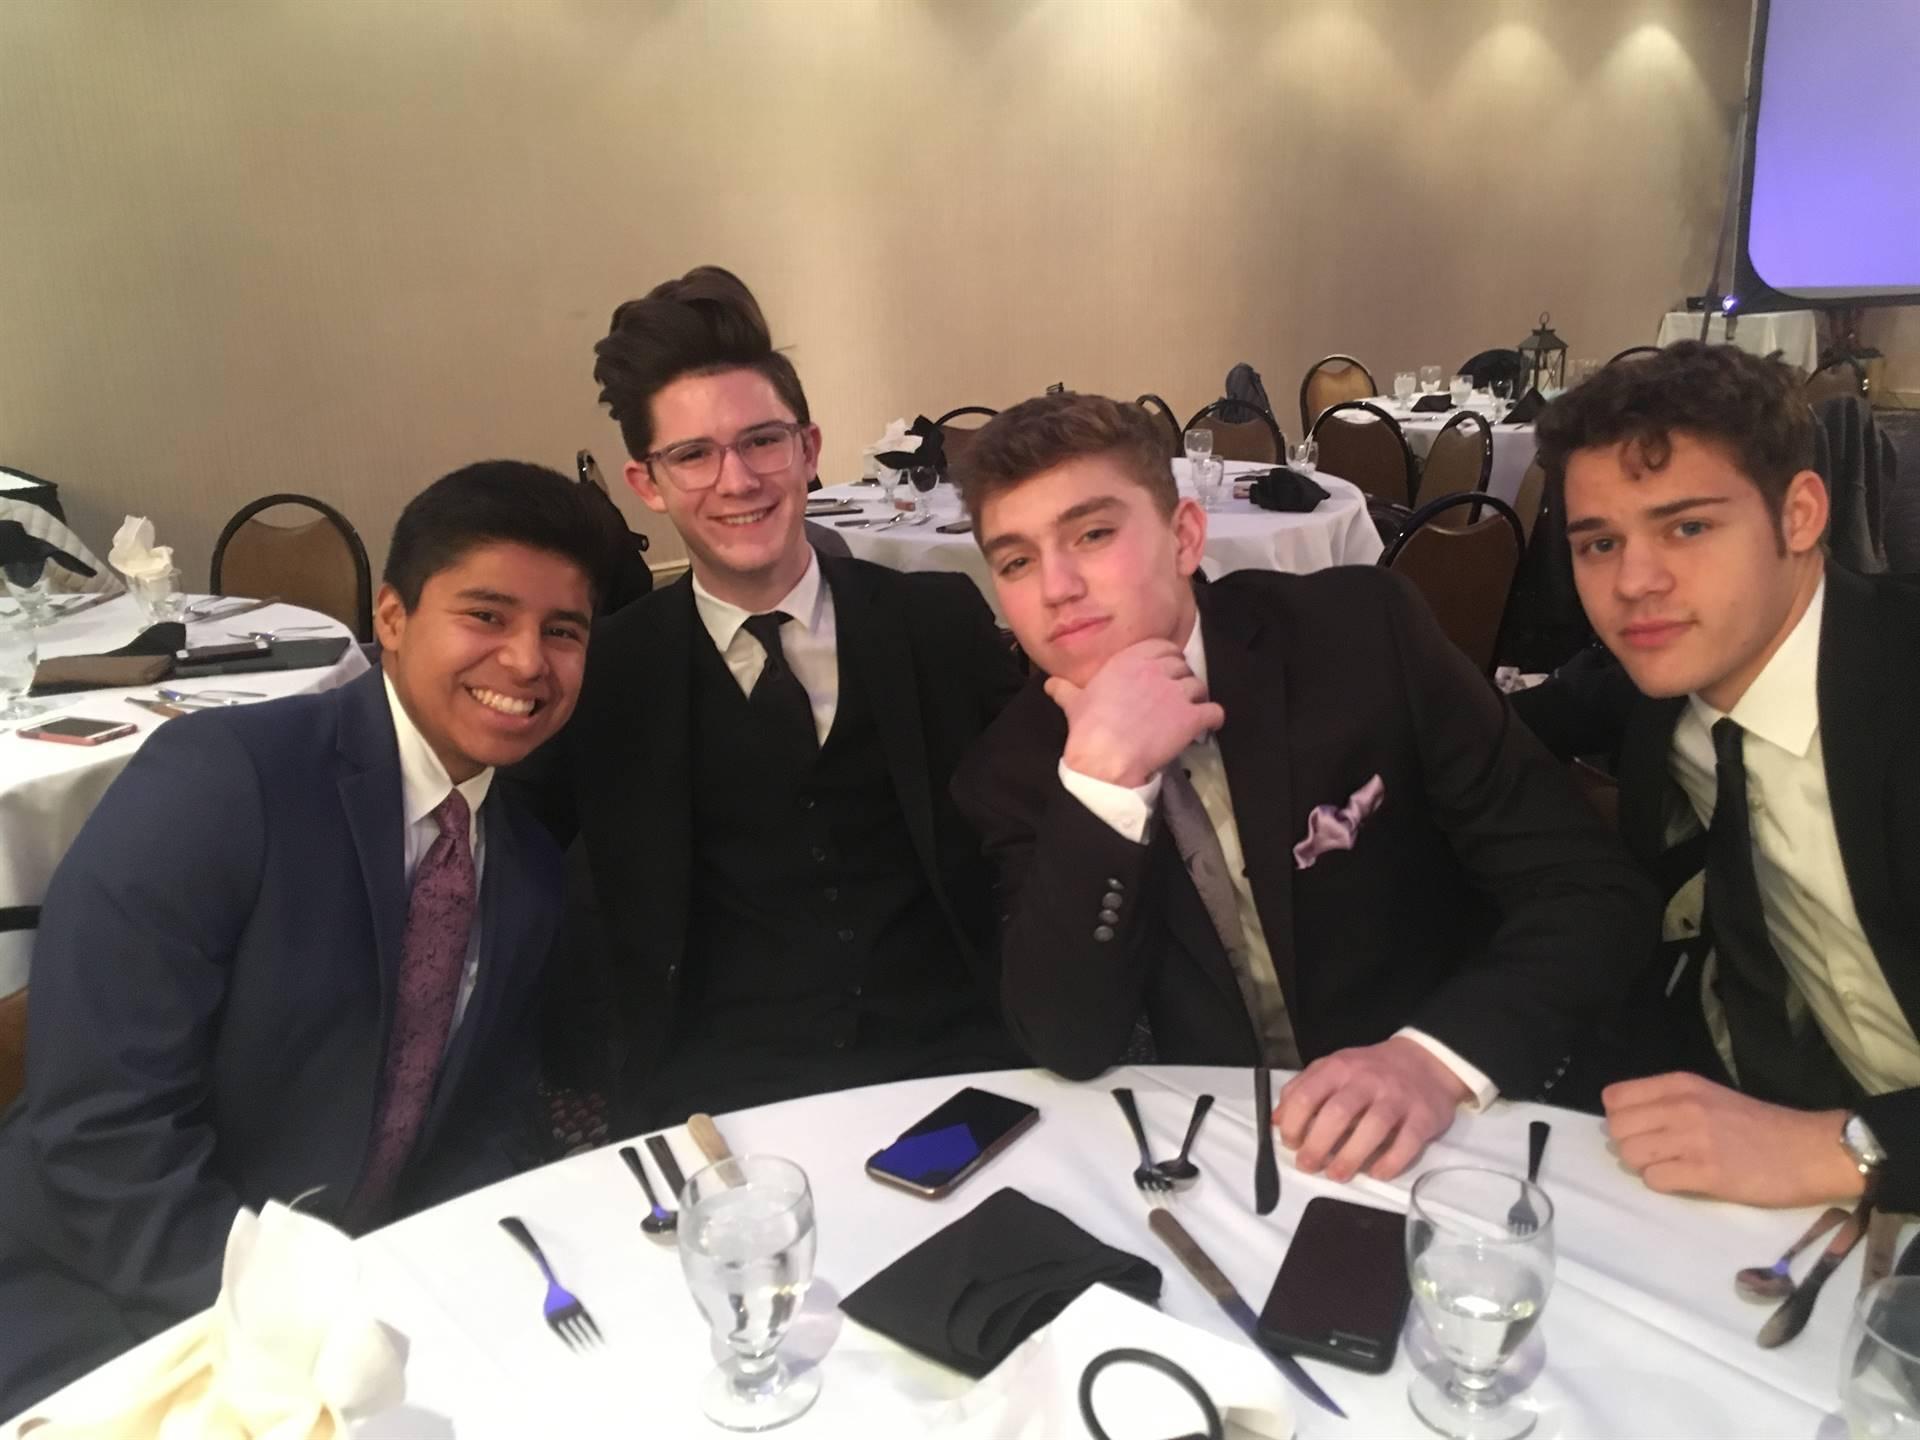 Eli, Sam, Rye, and Ian